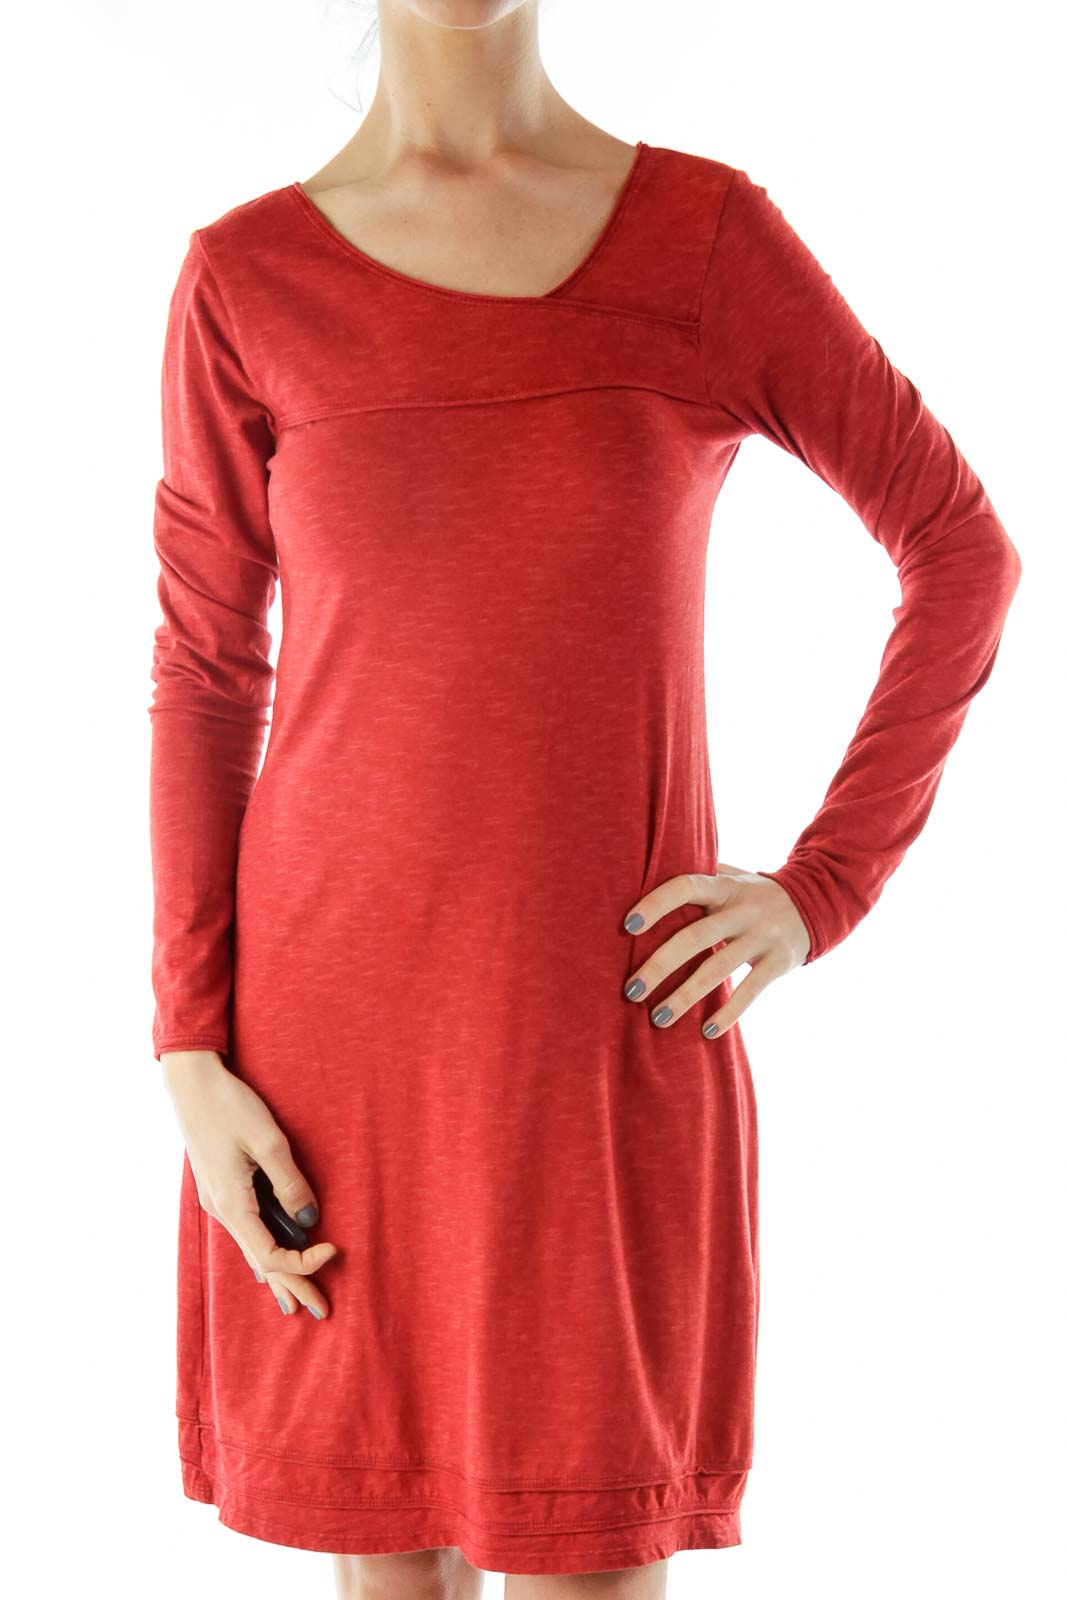 Red A-Line T-Shirt Dress Front